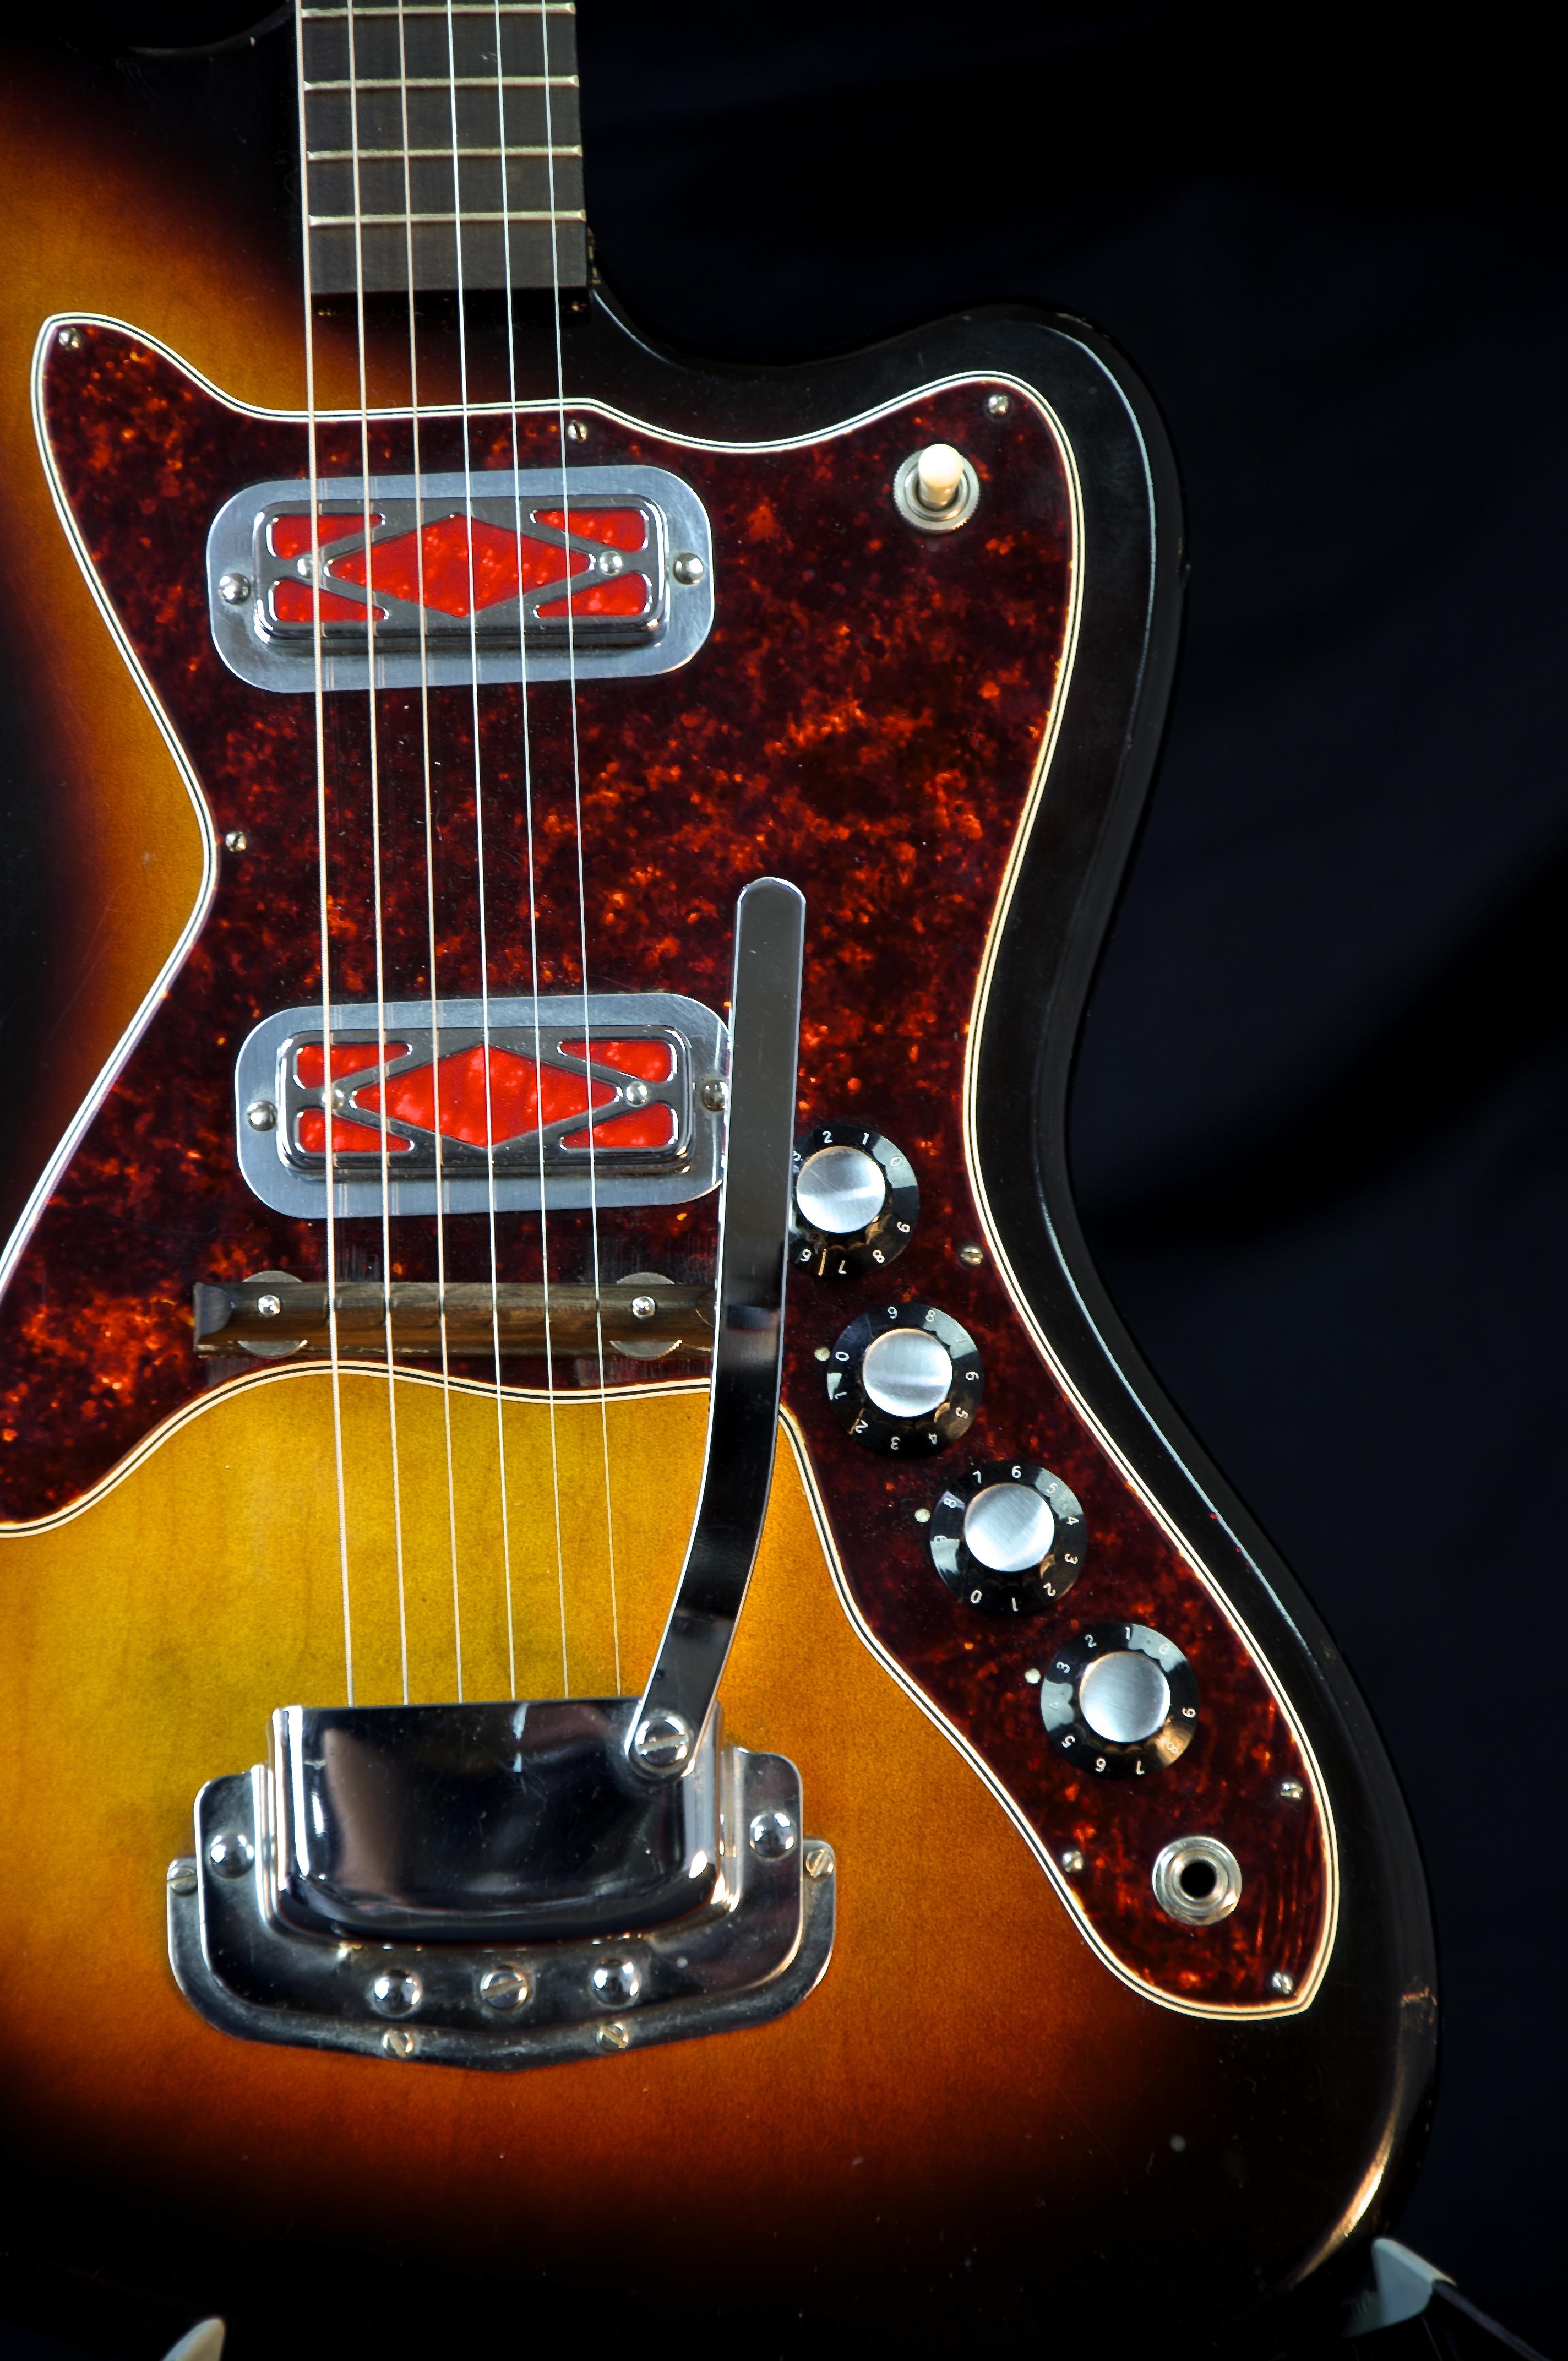 vintage harmony silhouette electric guitar grlc1223. Black Bedroom Furniture Sets. Home Design Ideas